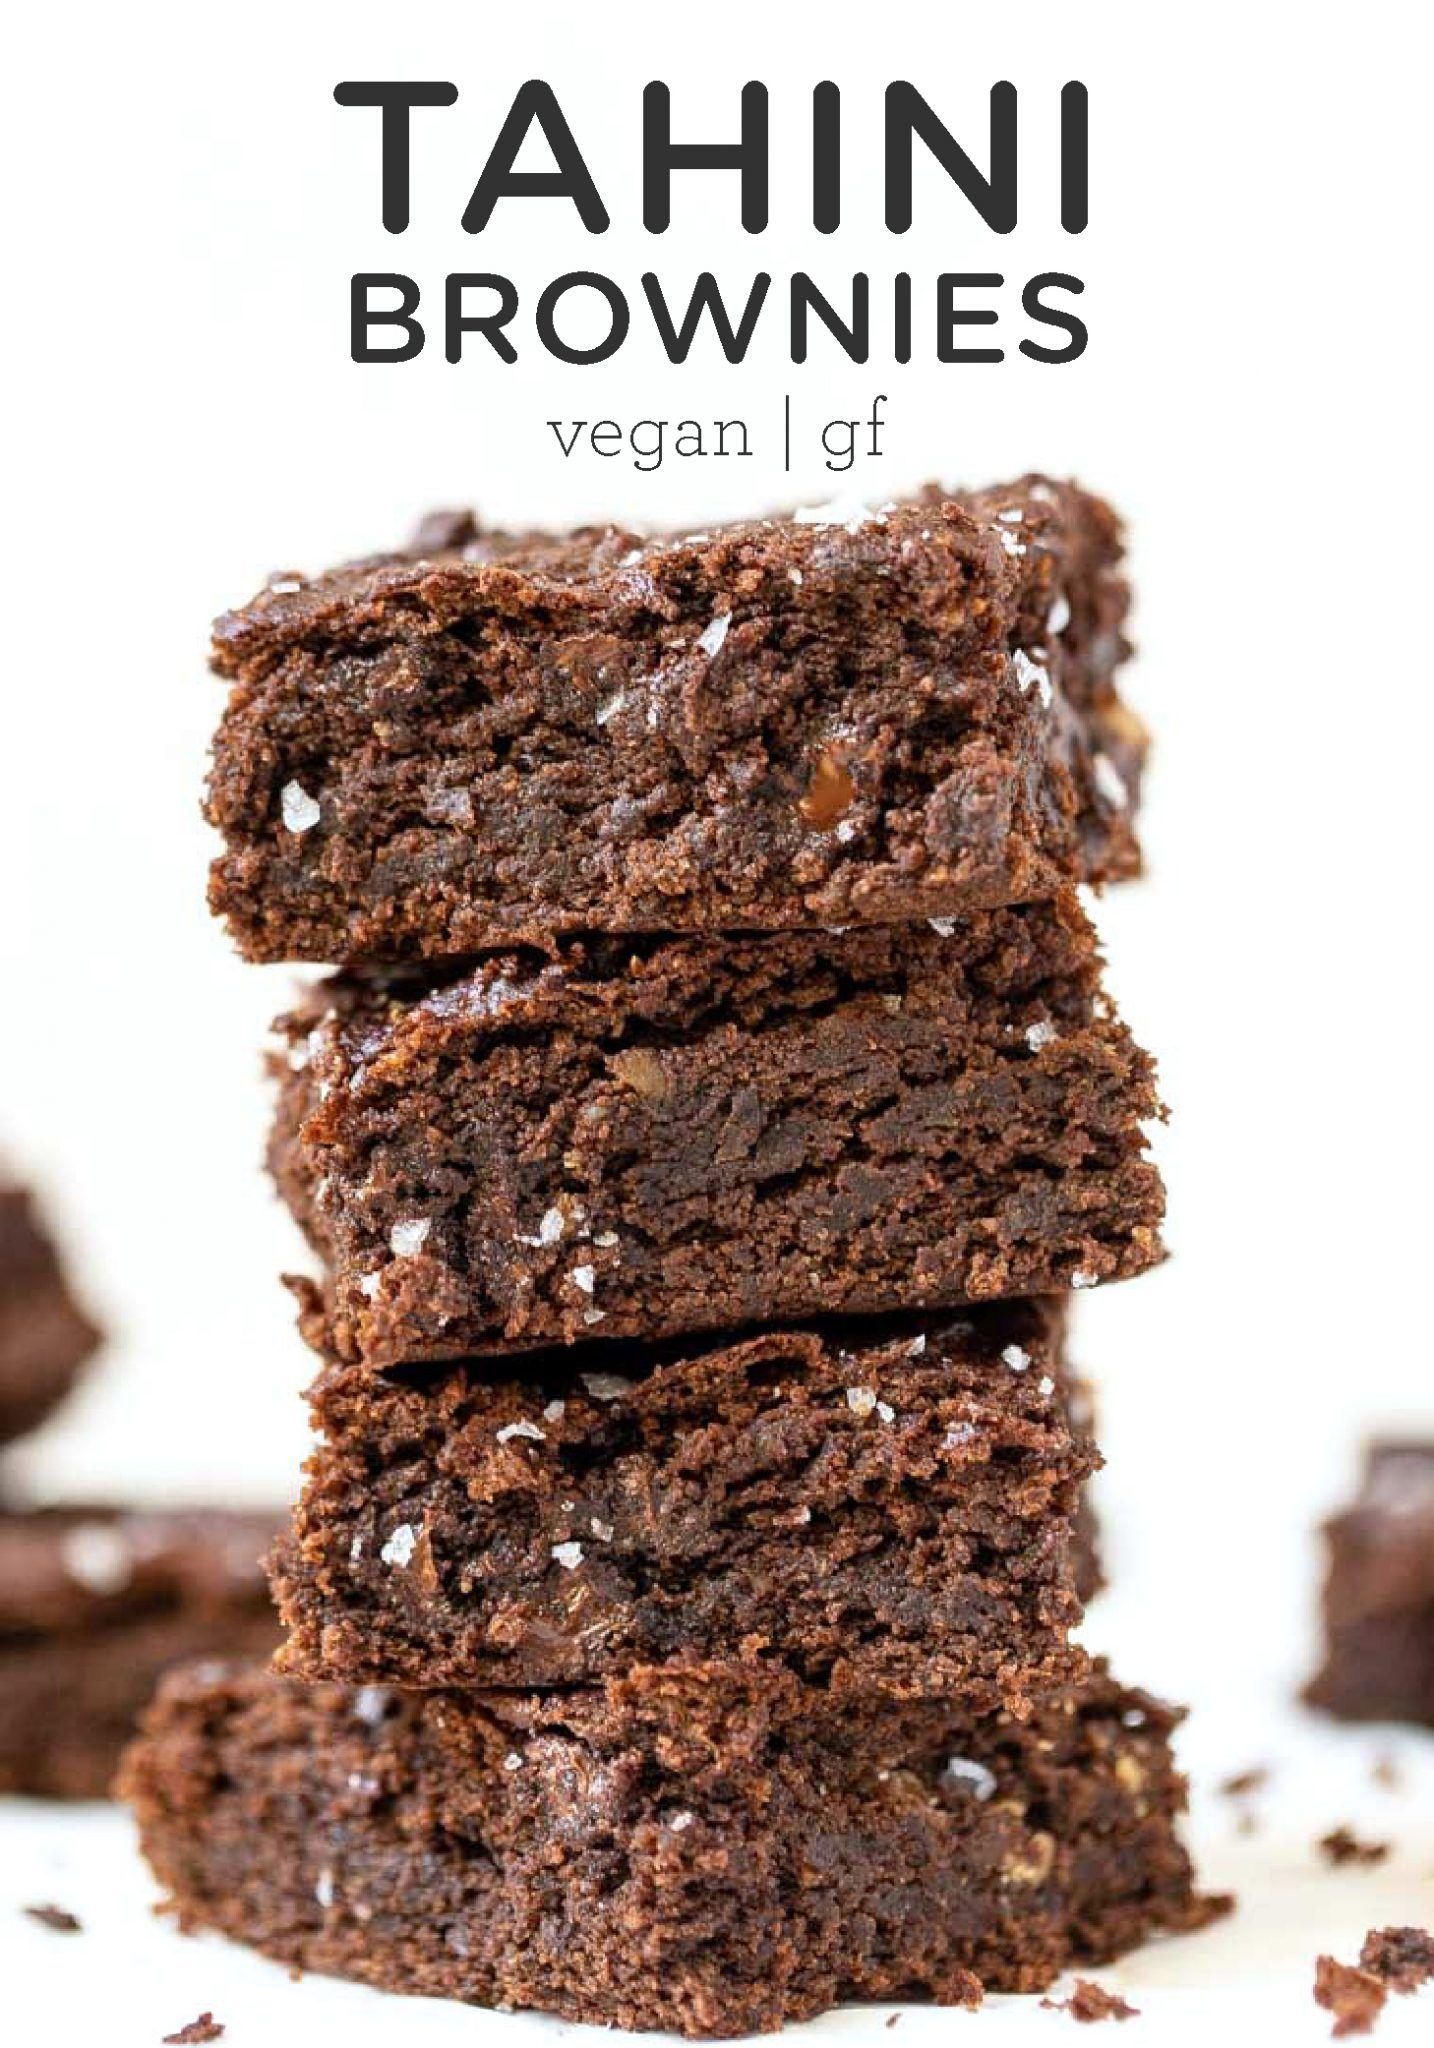 Healthy Tahini Brownies Vegan Gluten Free Simply Quinoa Recipe Coconut Flour Recipes Vegan Brownies Recipe Flour Recipes